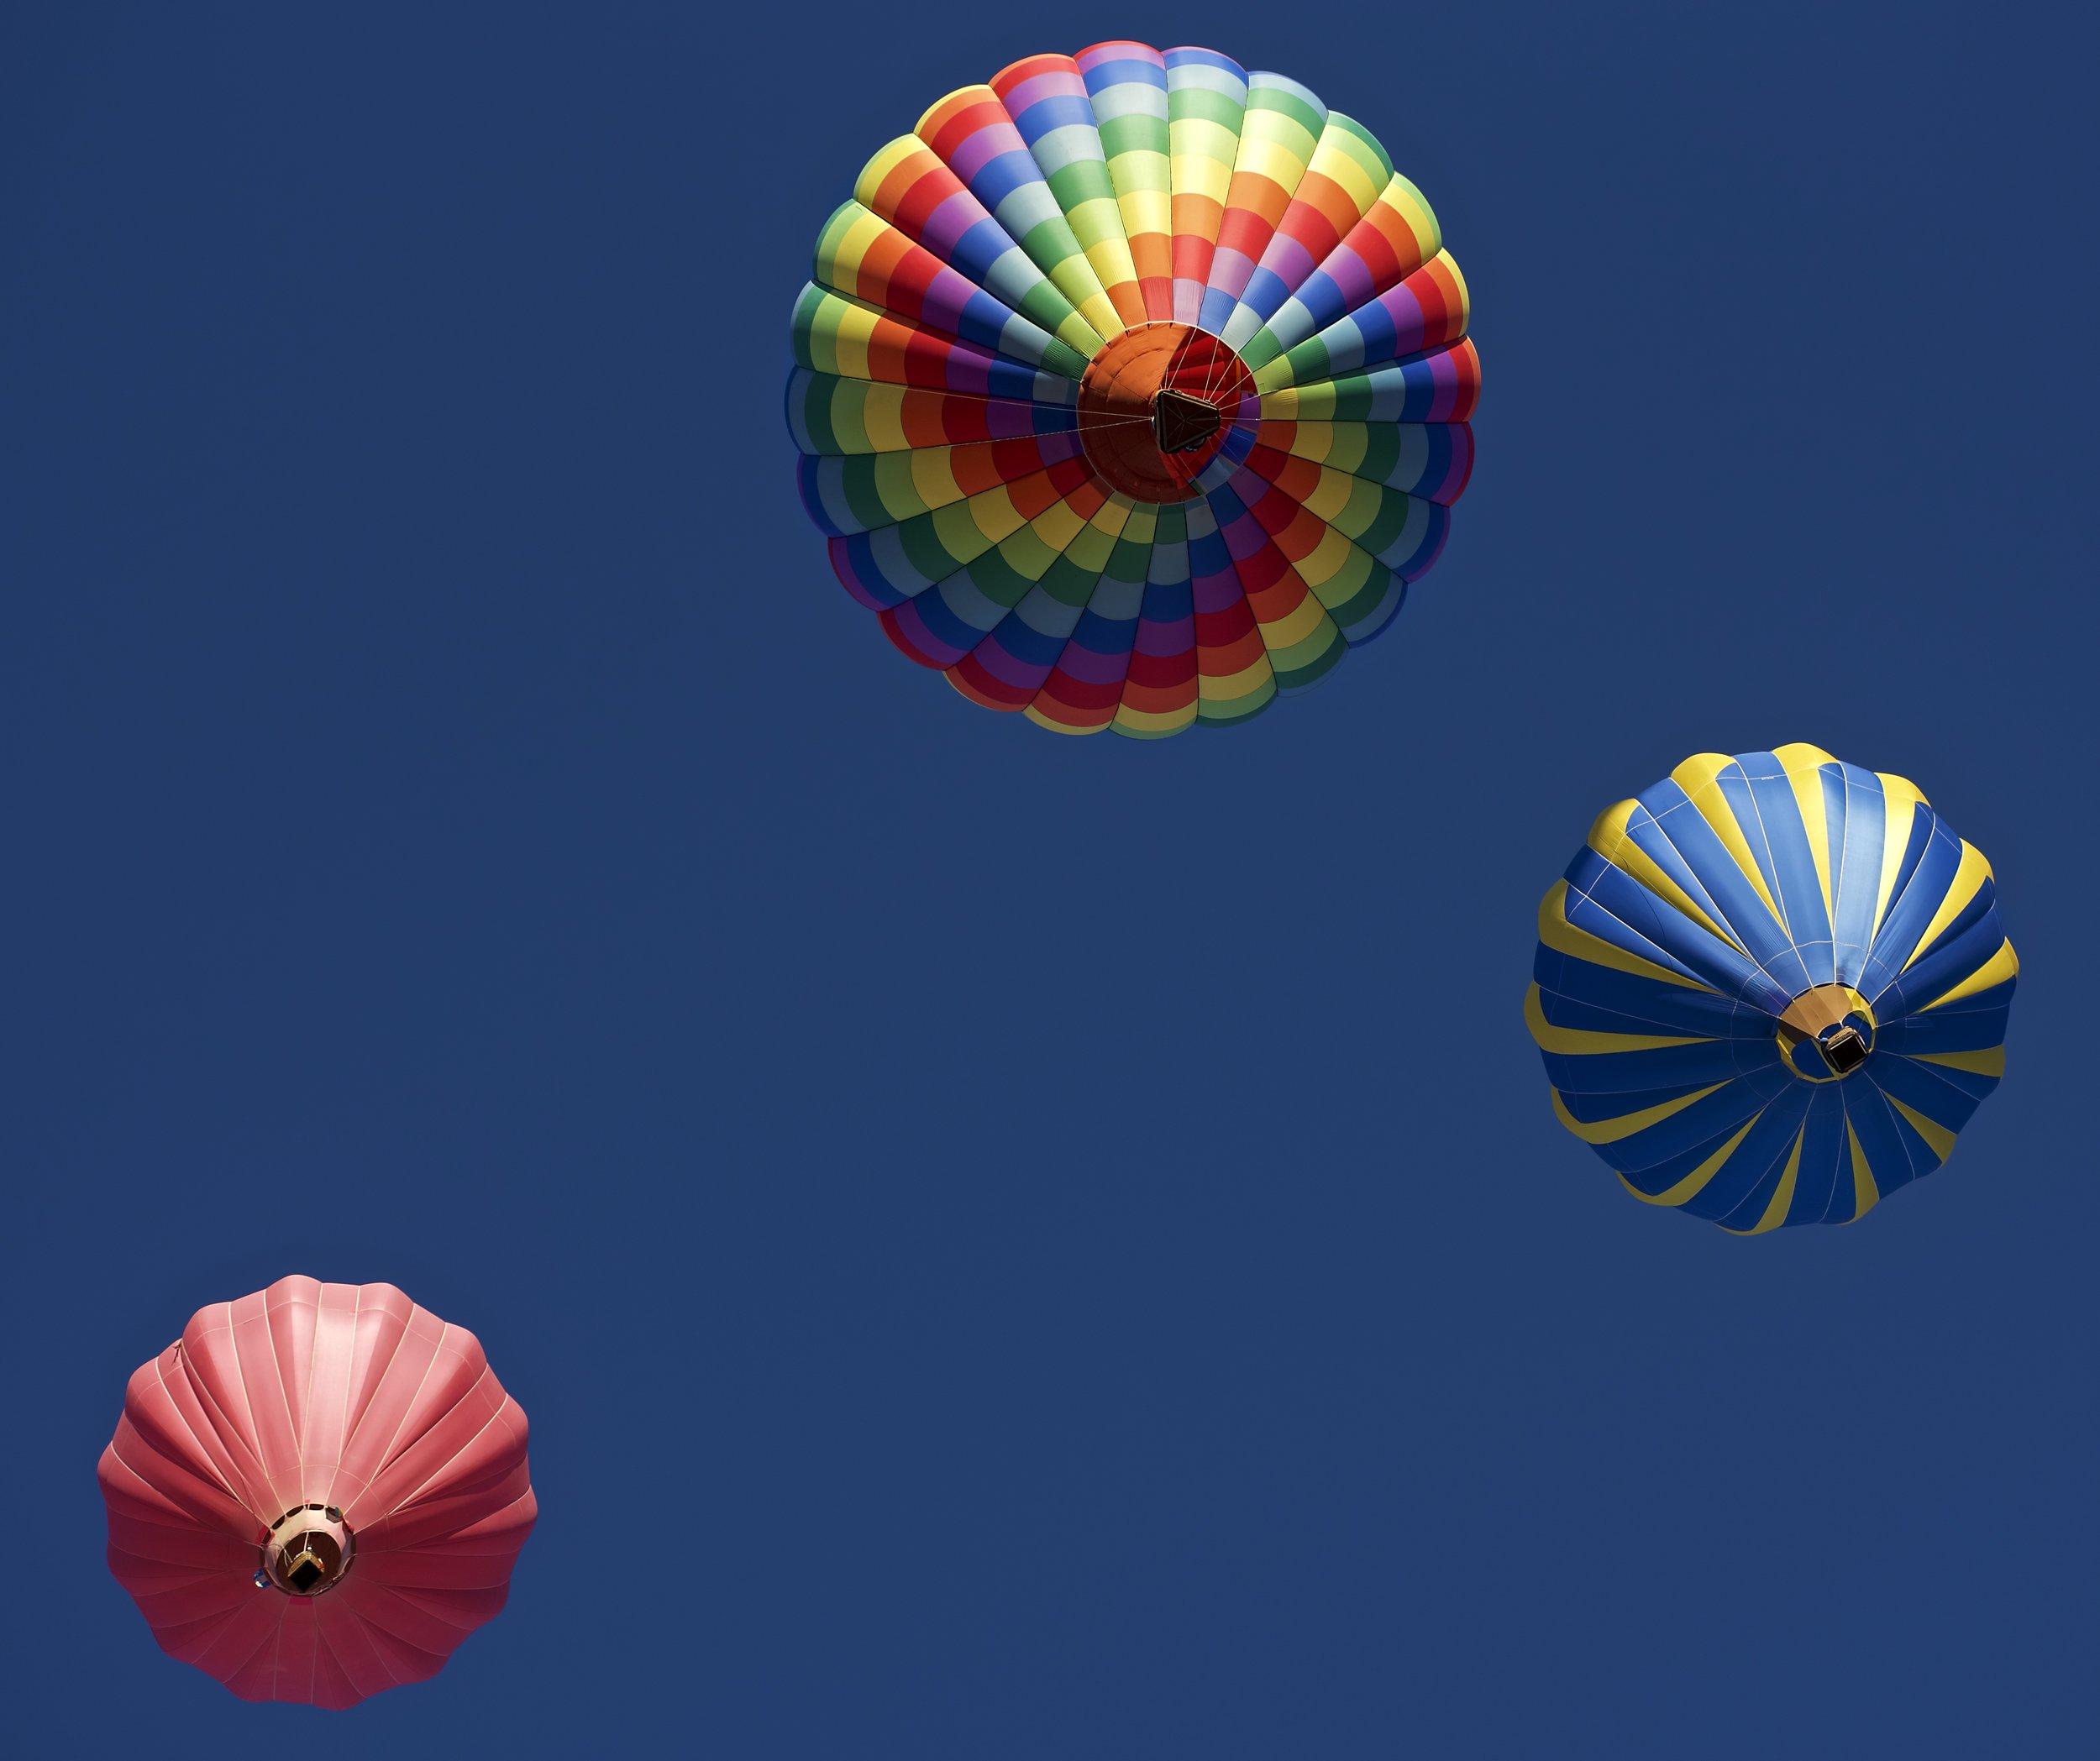 Under 3 Balloons